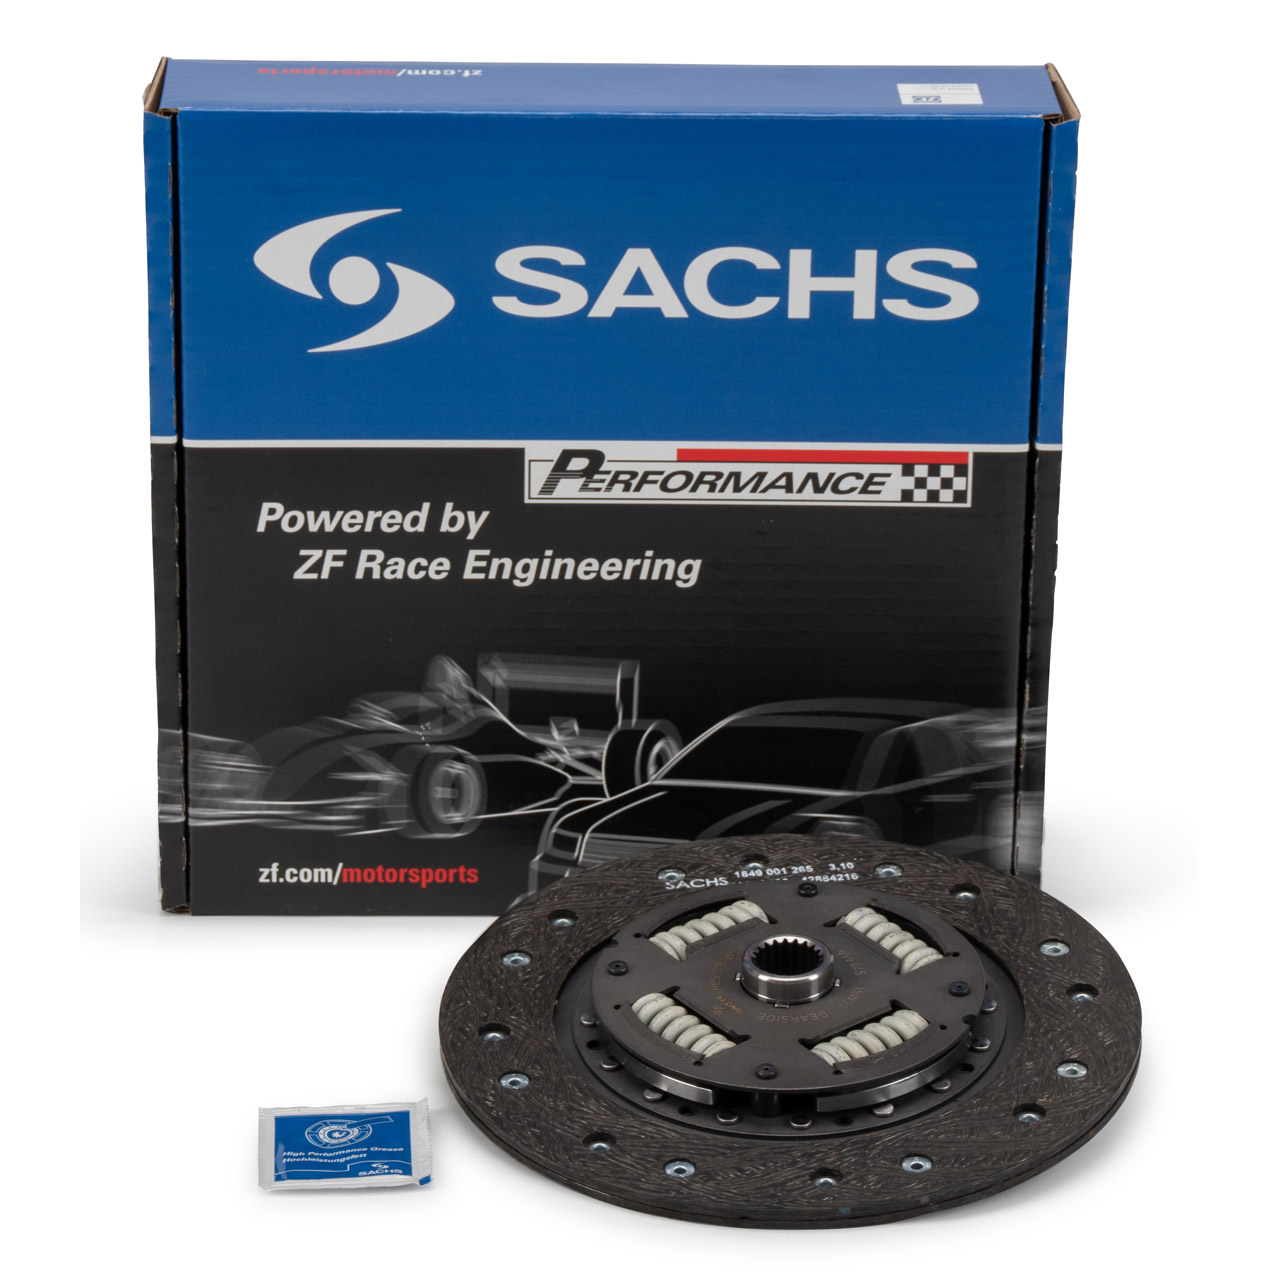 SACHS PERFORMANCE 881861999845 Kupplungsscheibe PORSCHE 911 2.3 T/E/S 2.7/3.0/3.2 Carrera